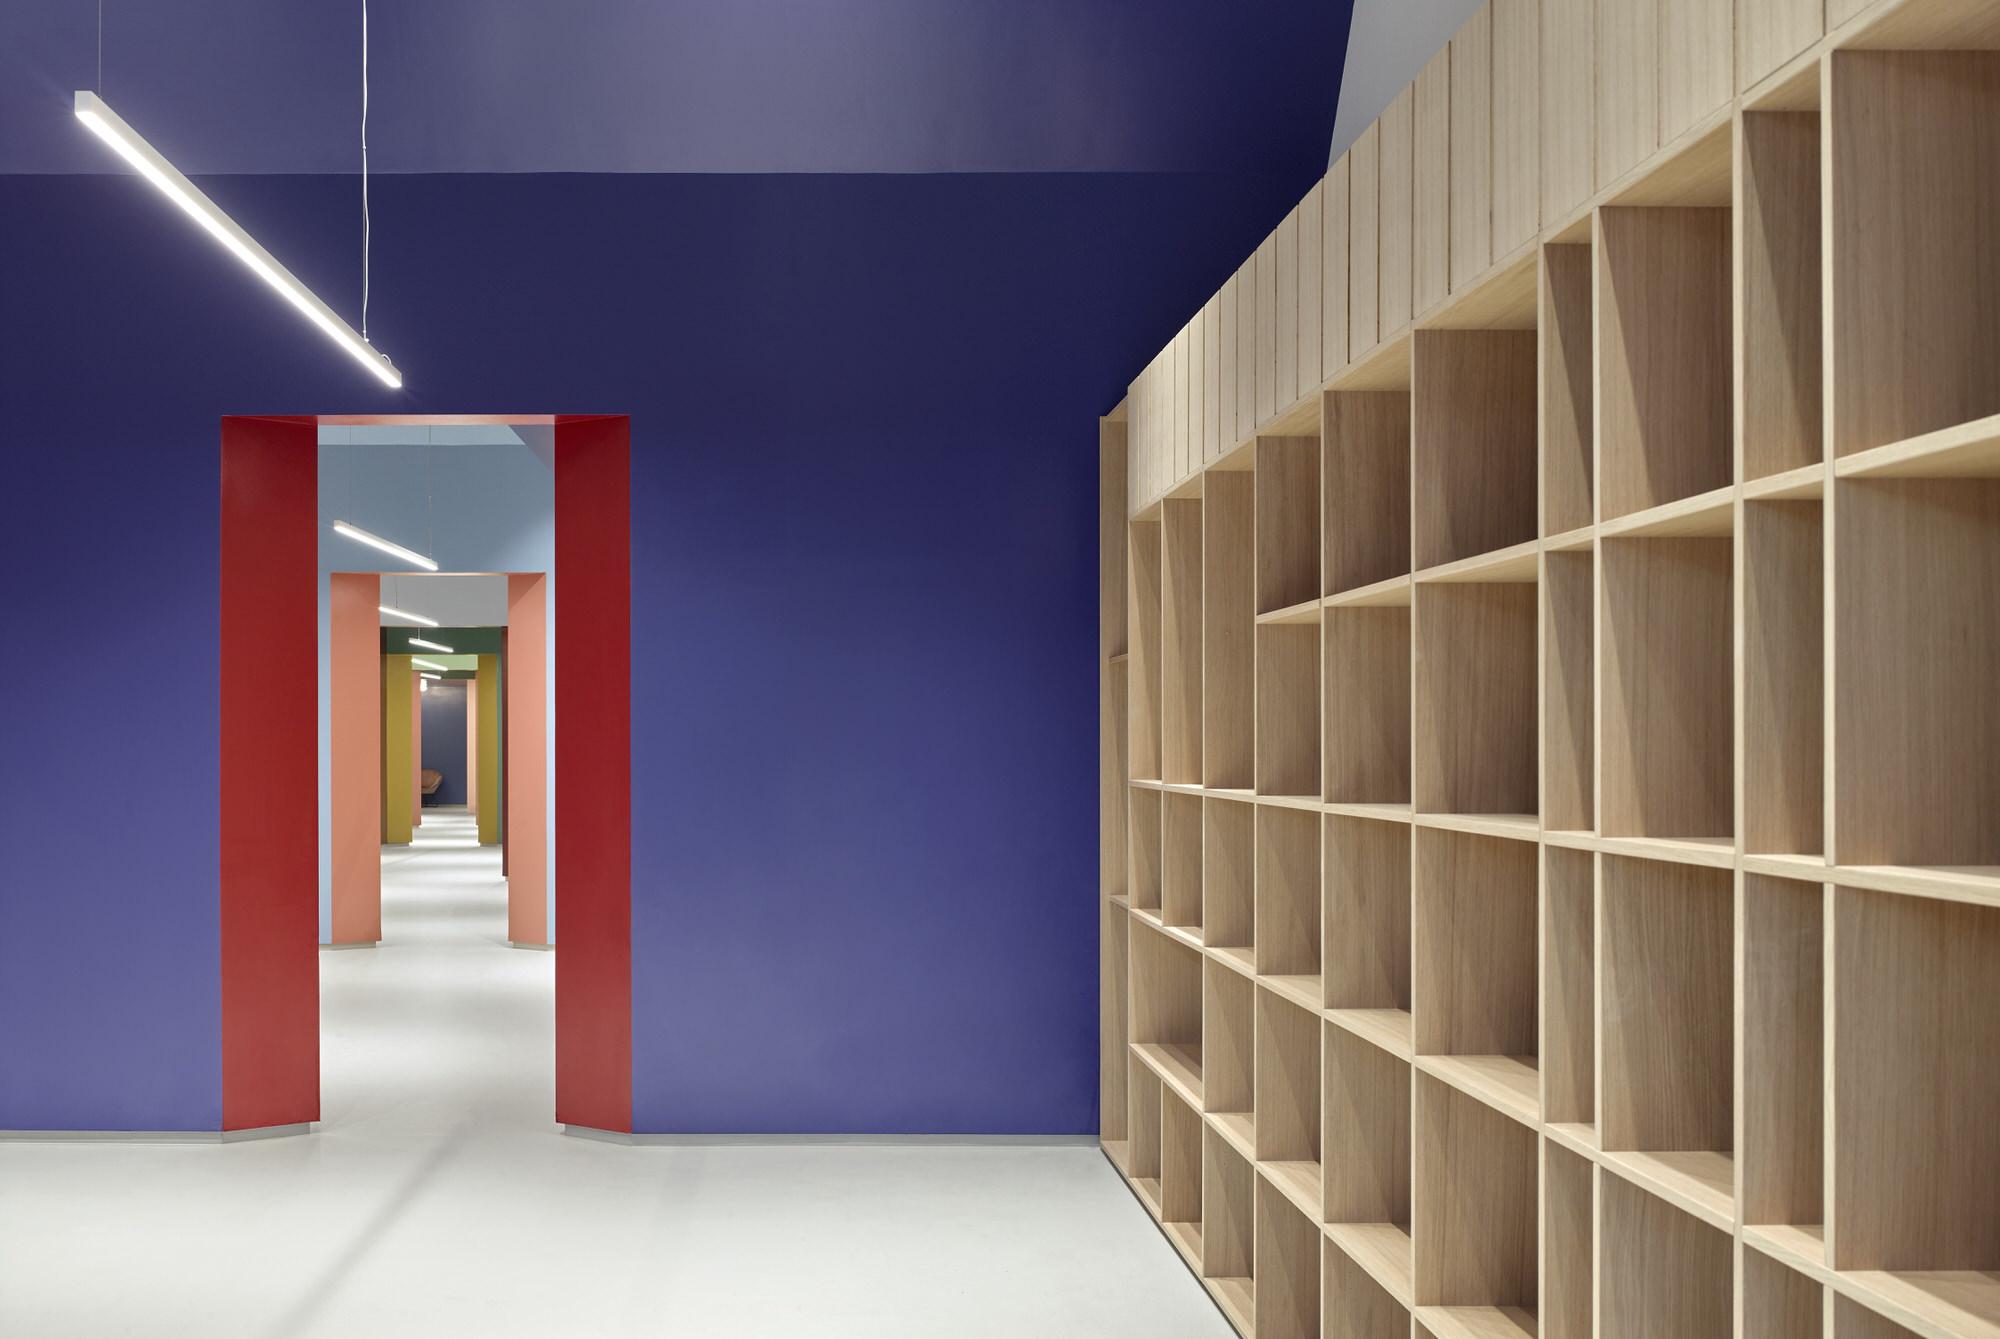 Baranowitz Goldberg Kaza Israel Showroom Interior Design Photo Shai Gil Yellowtrace 05